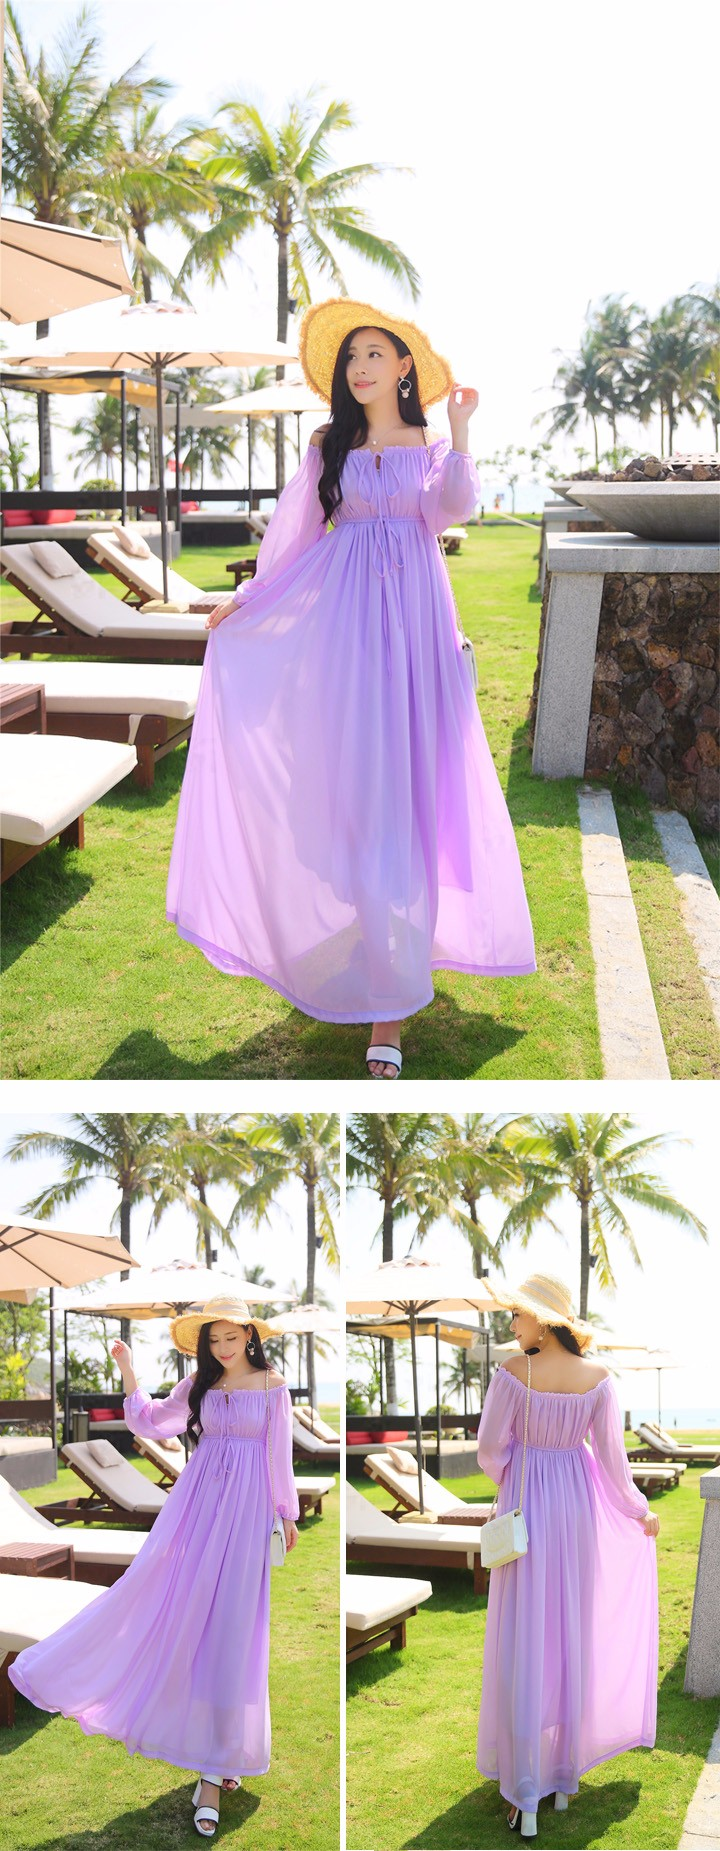 Dress Summer Women Long Dress 2016 Fashion Chiffon Dress New Arrival Empire Slash Neck Dresses Maxi  Ankle-Length Lavender Dress